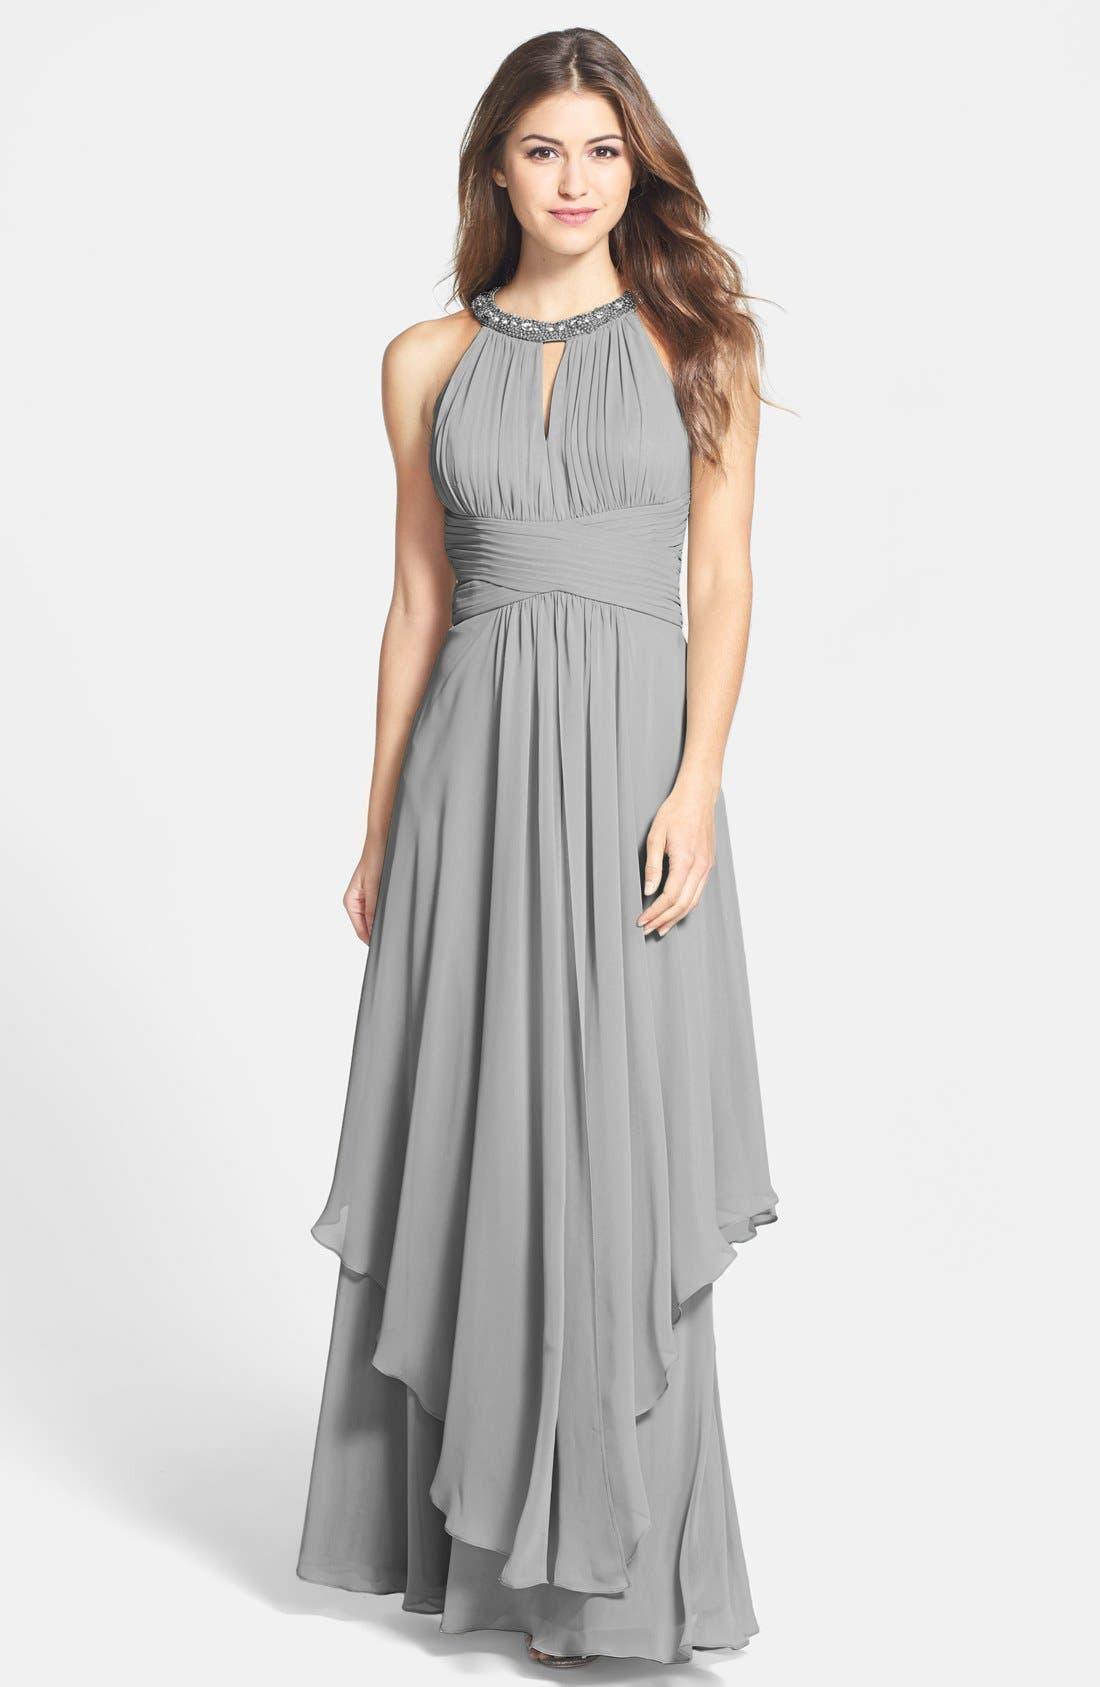 Alternate Image 1 Selected - Eliza J Embellished Tiered Chiffon Halter Gown